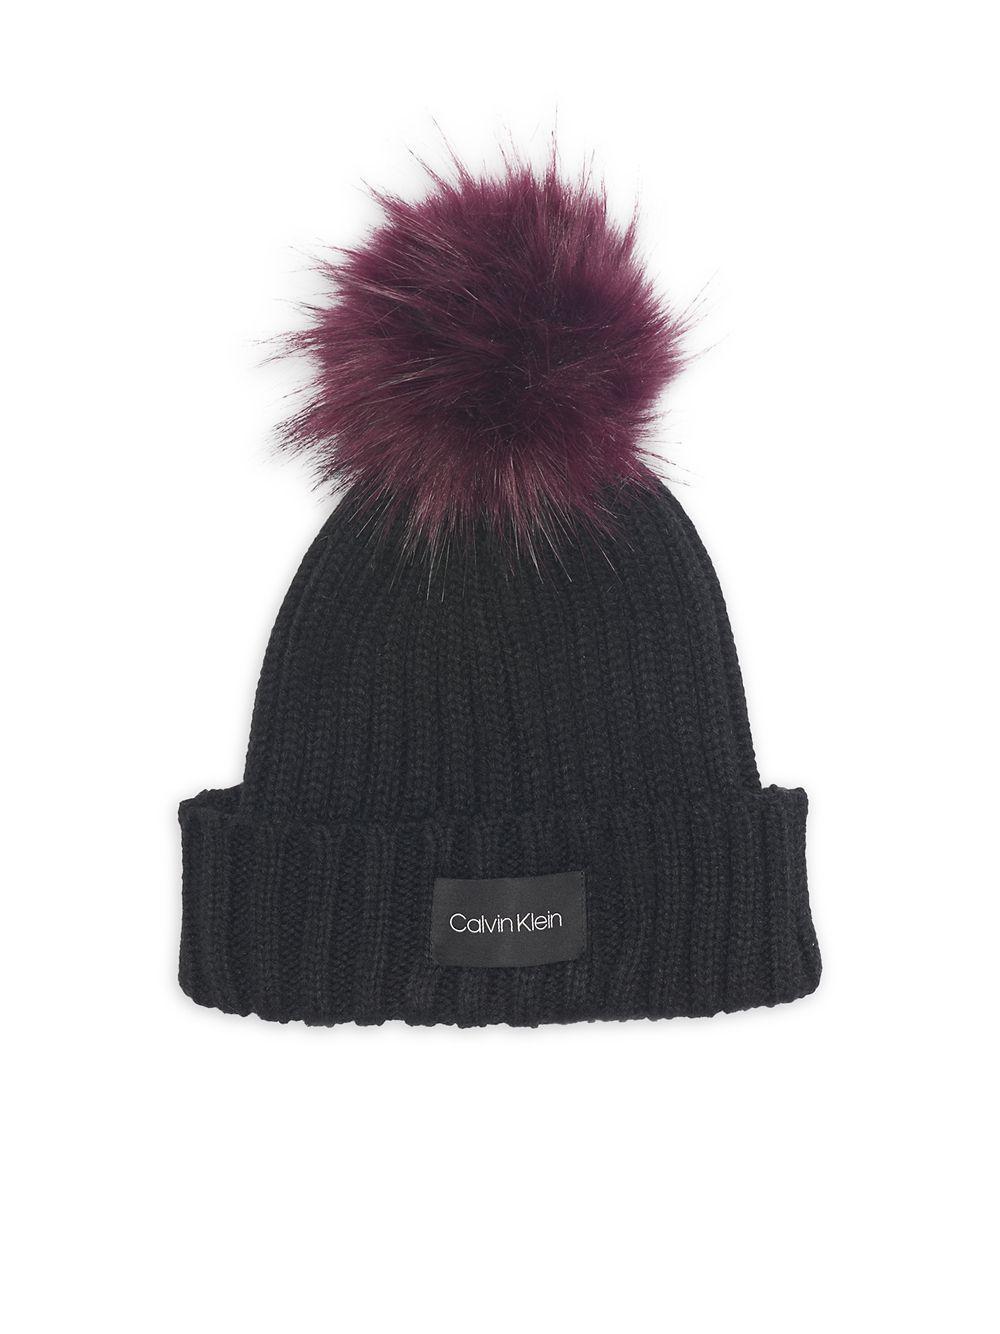 67b2b9009df Lyst - Calvin Klein Pop Color Knit Faux Fur Pom-pom Beanie in Black